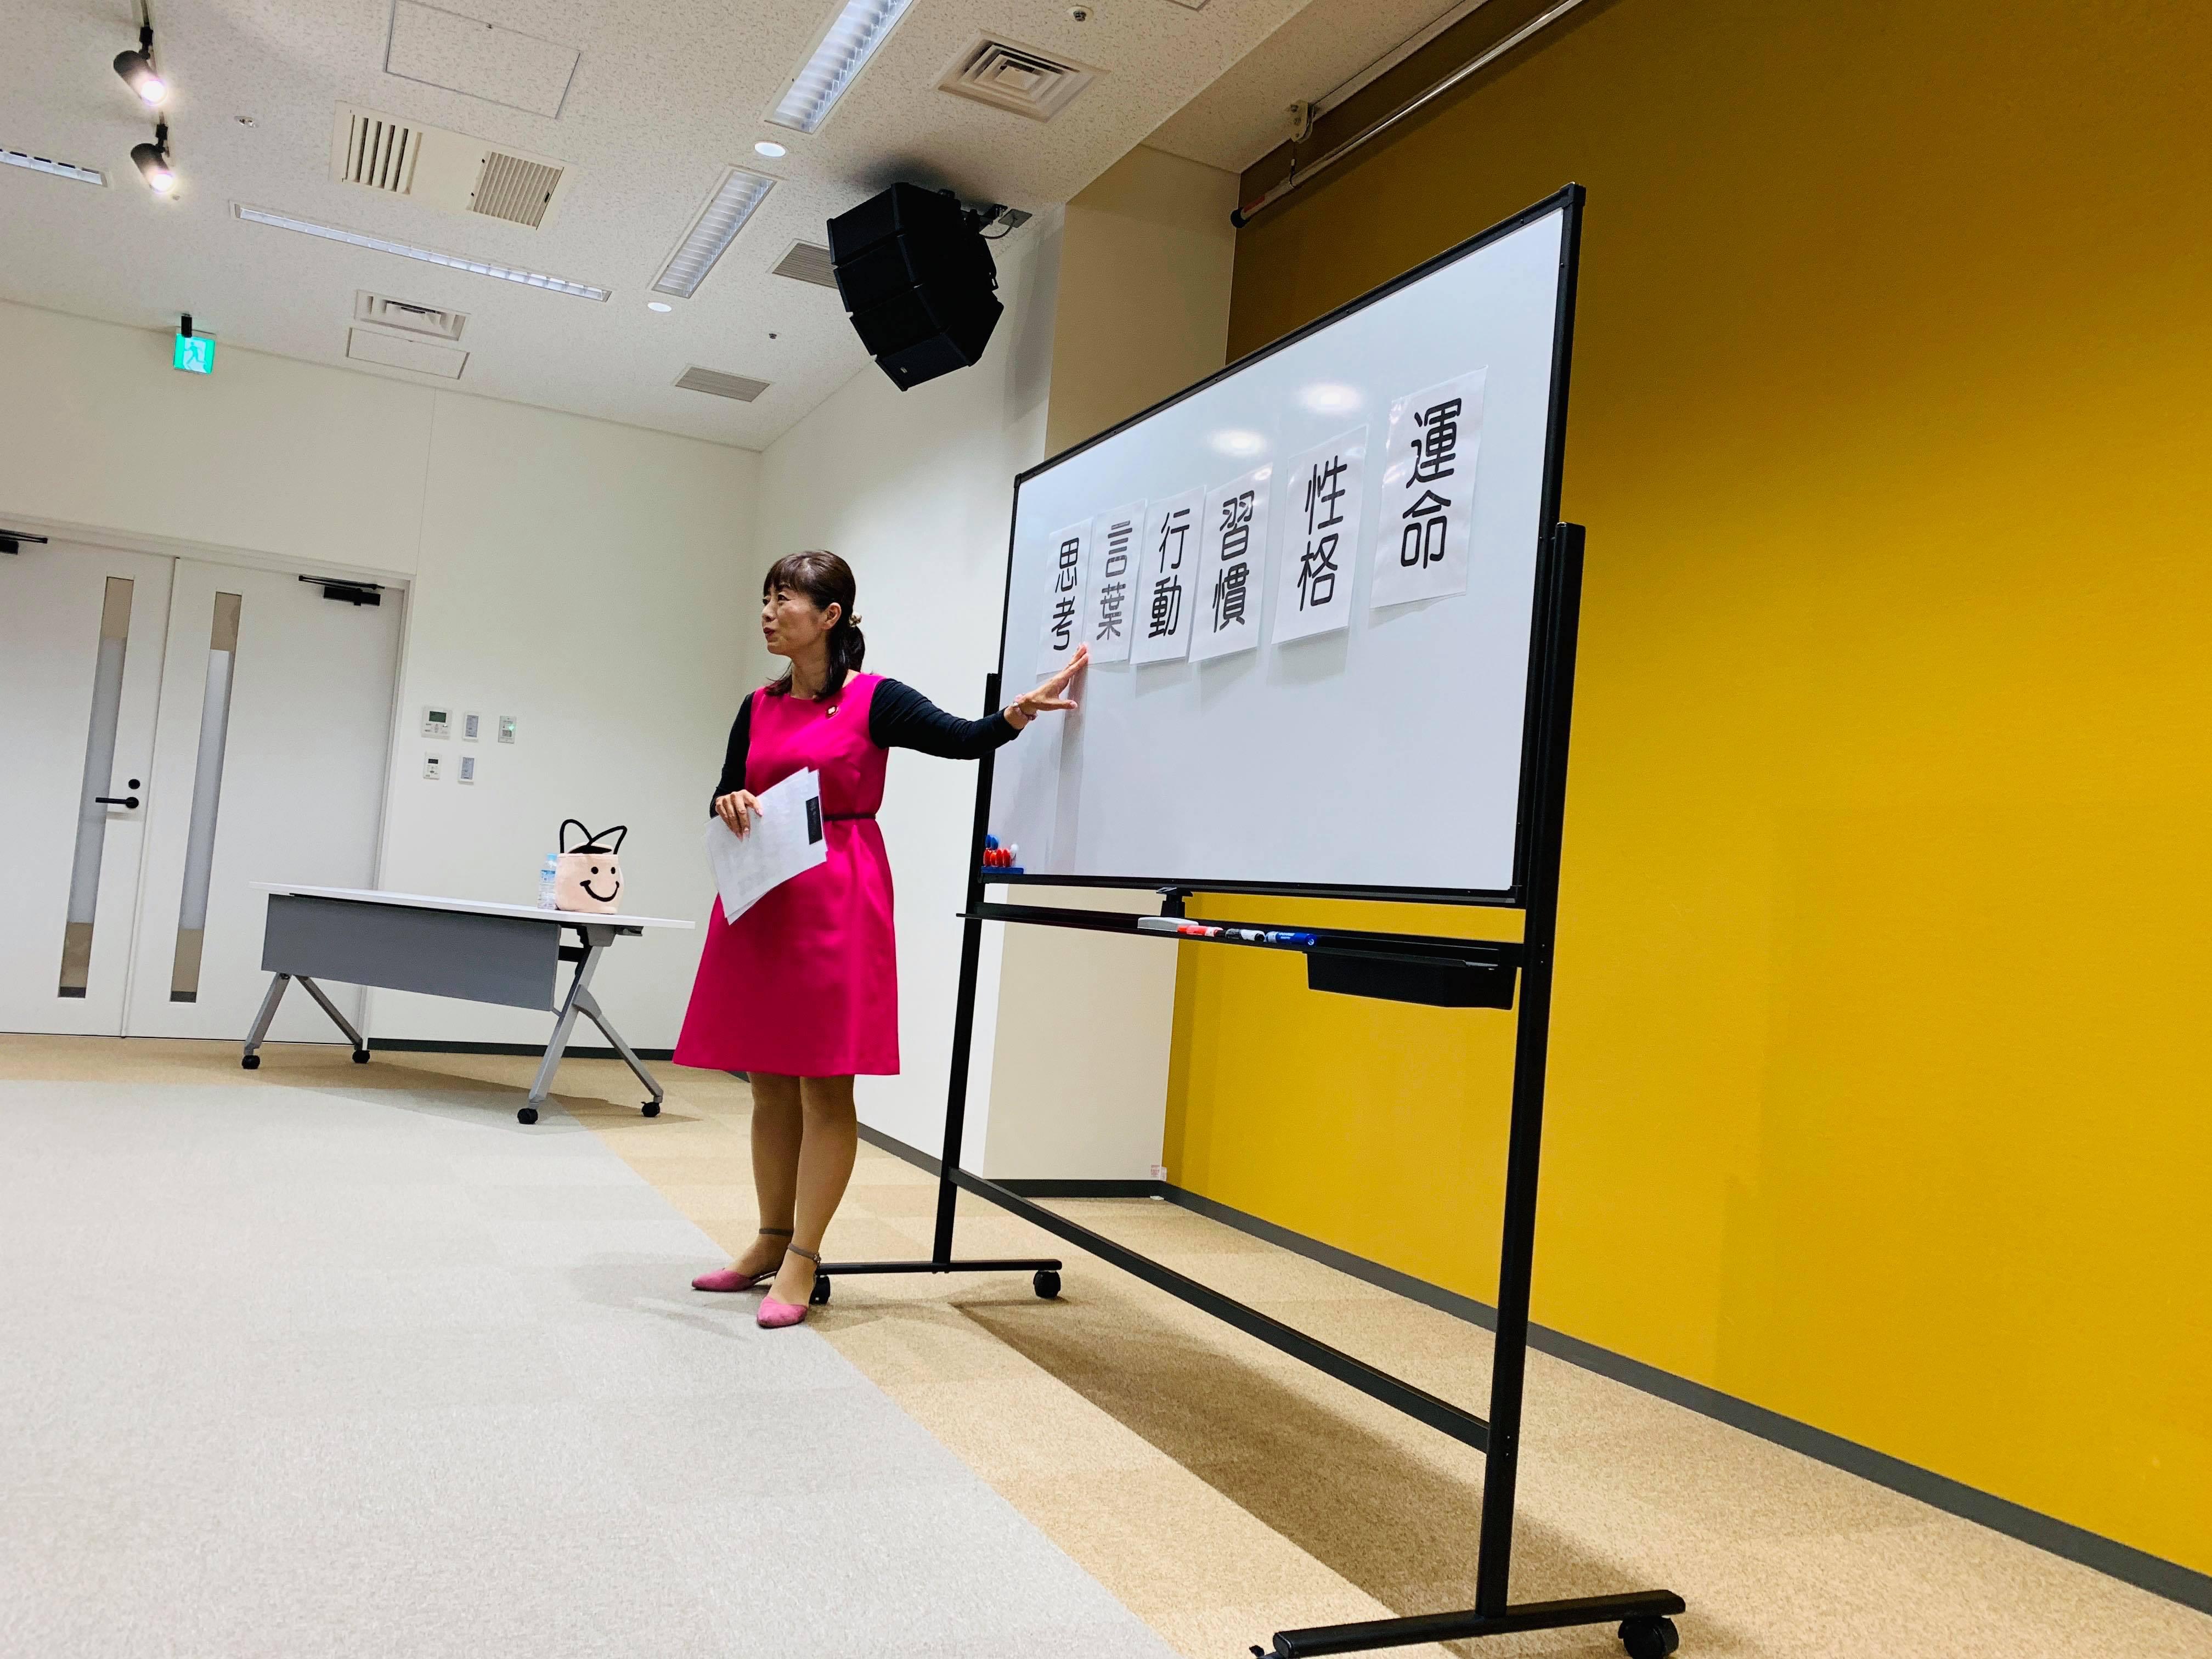 45551127 2199841306933810 3969010622904926208 n - 2018年11月7日青森県東北中学校AFS(AOsukiフューチャーズゼミ)開催しました。